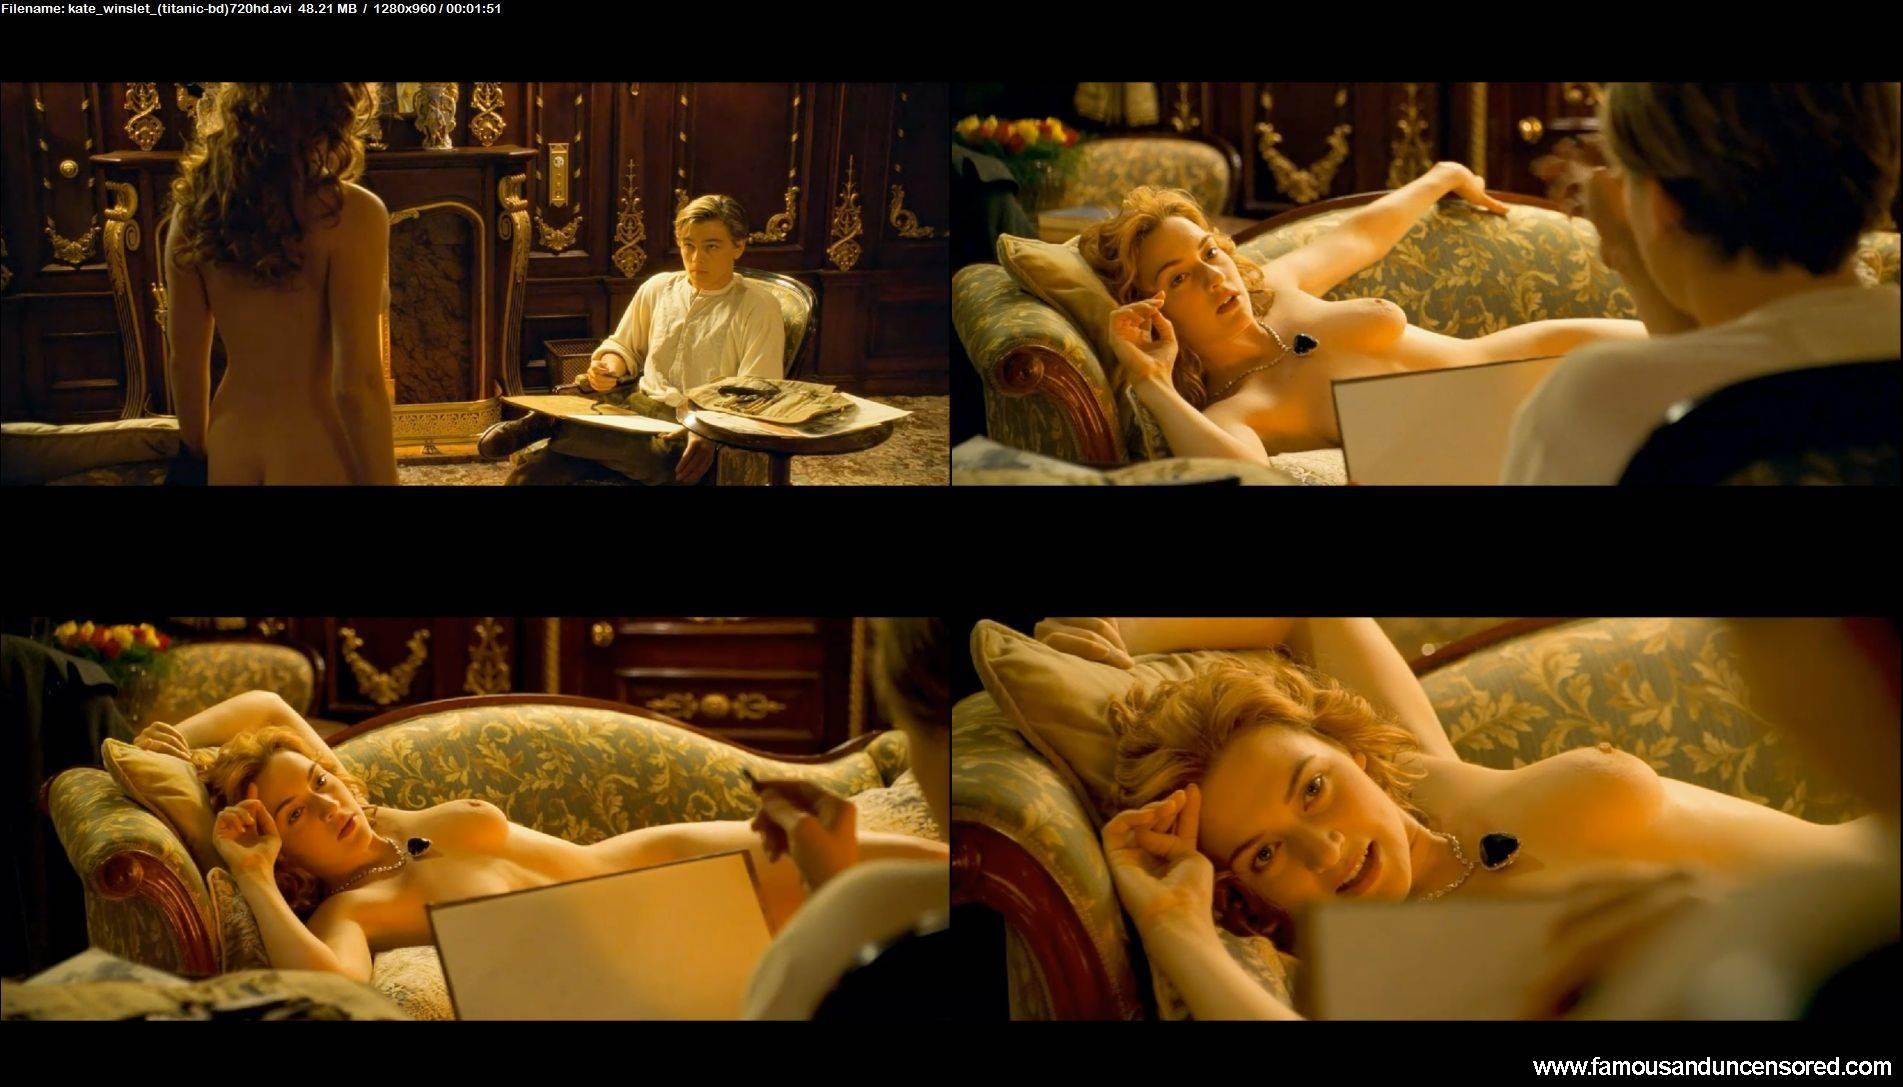 The valuable Titenic film hot scen